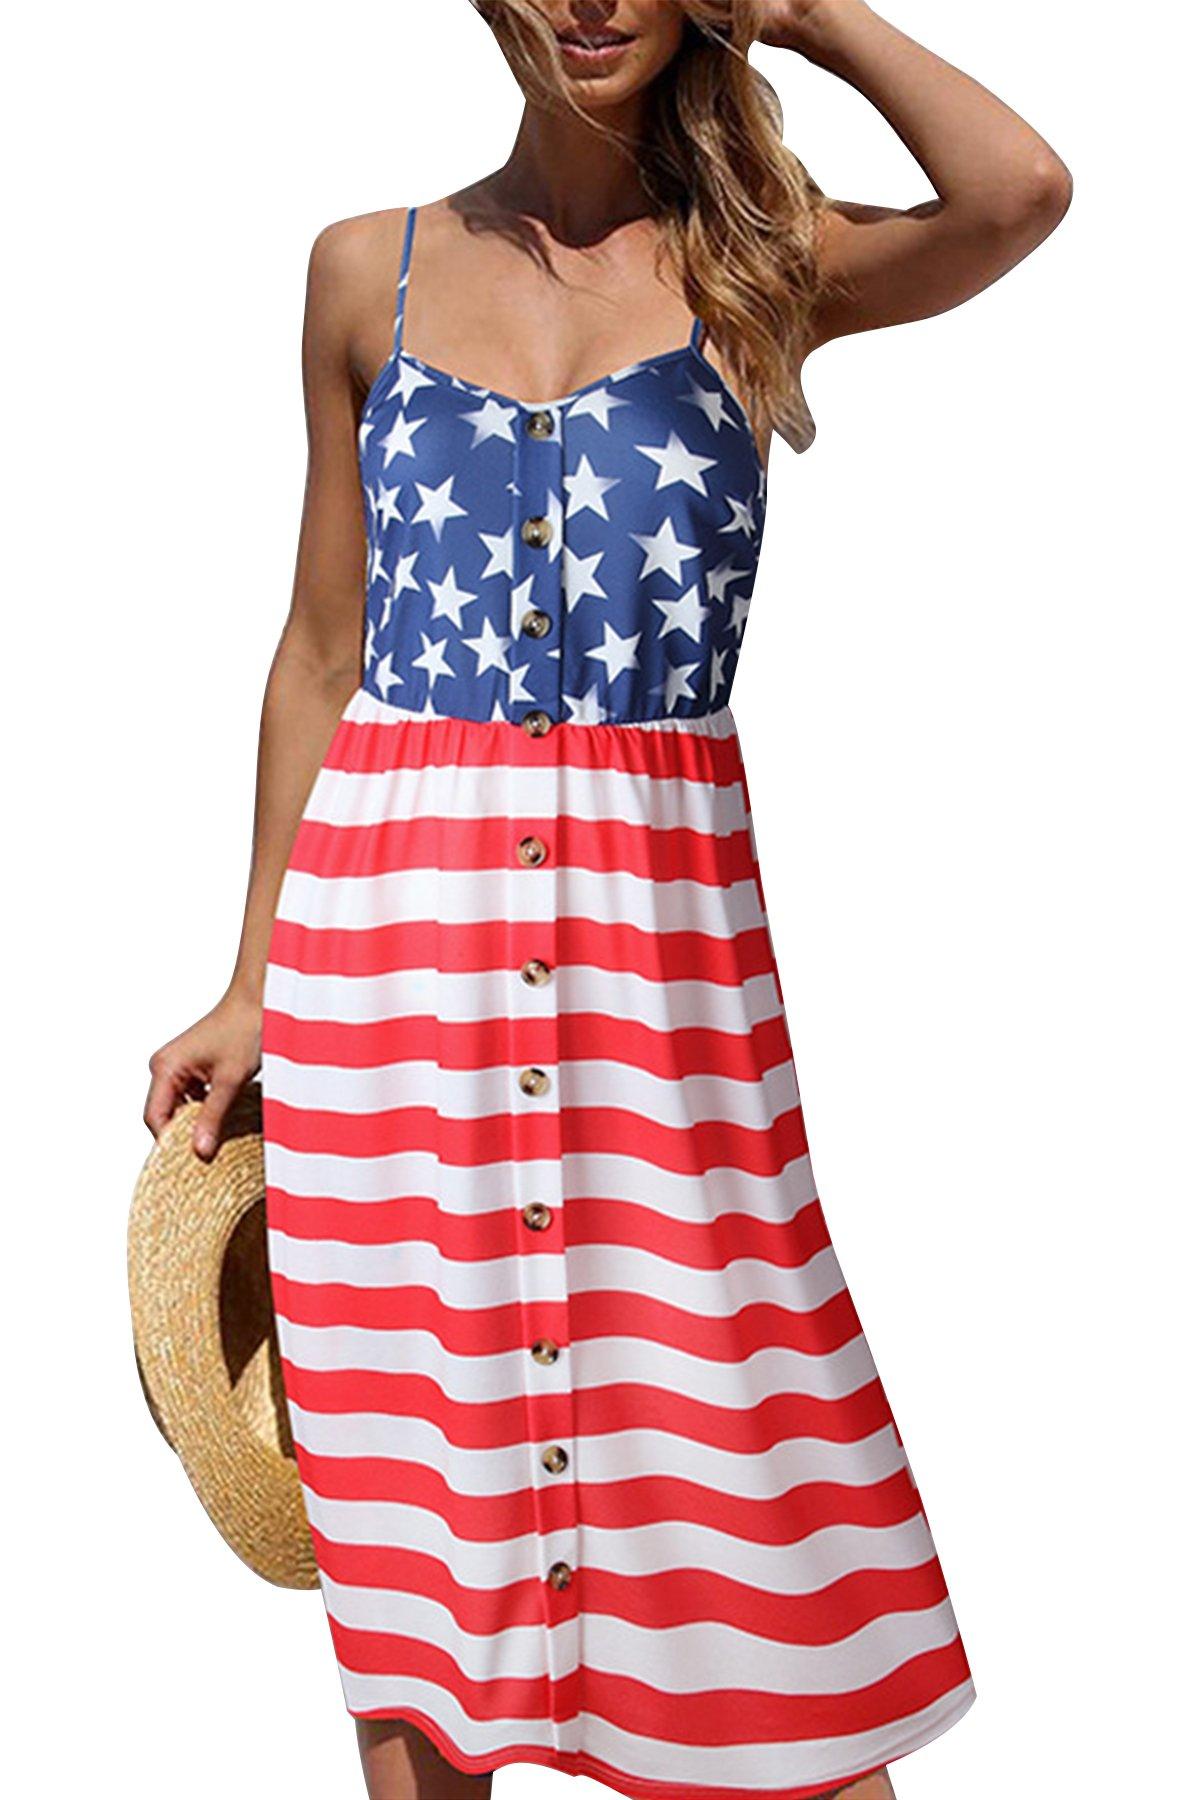 JOXJOZ Women's Summer V-Neck Spaghetti Strap Button Down Swing Midi Party Dress (S)